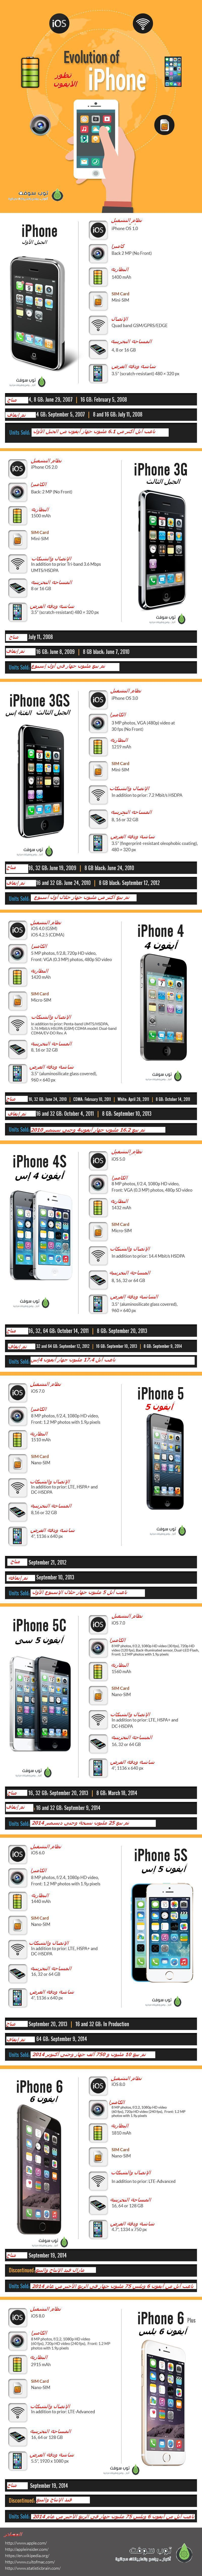 Evolution-of-iPhone1